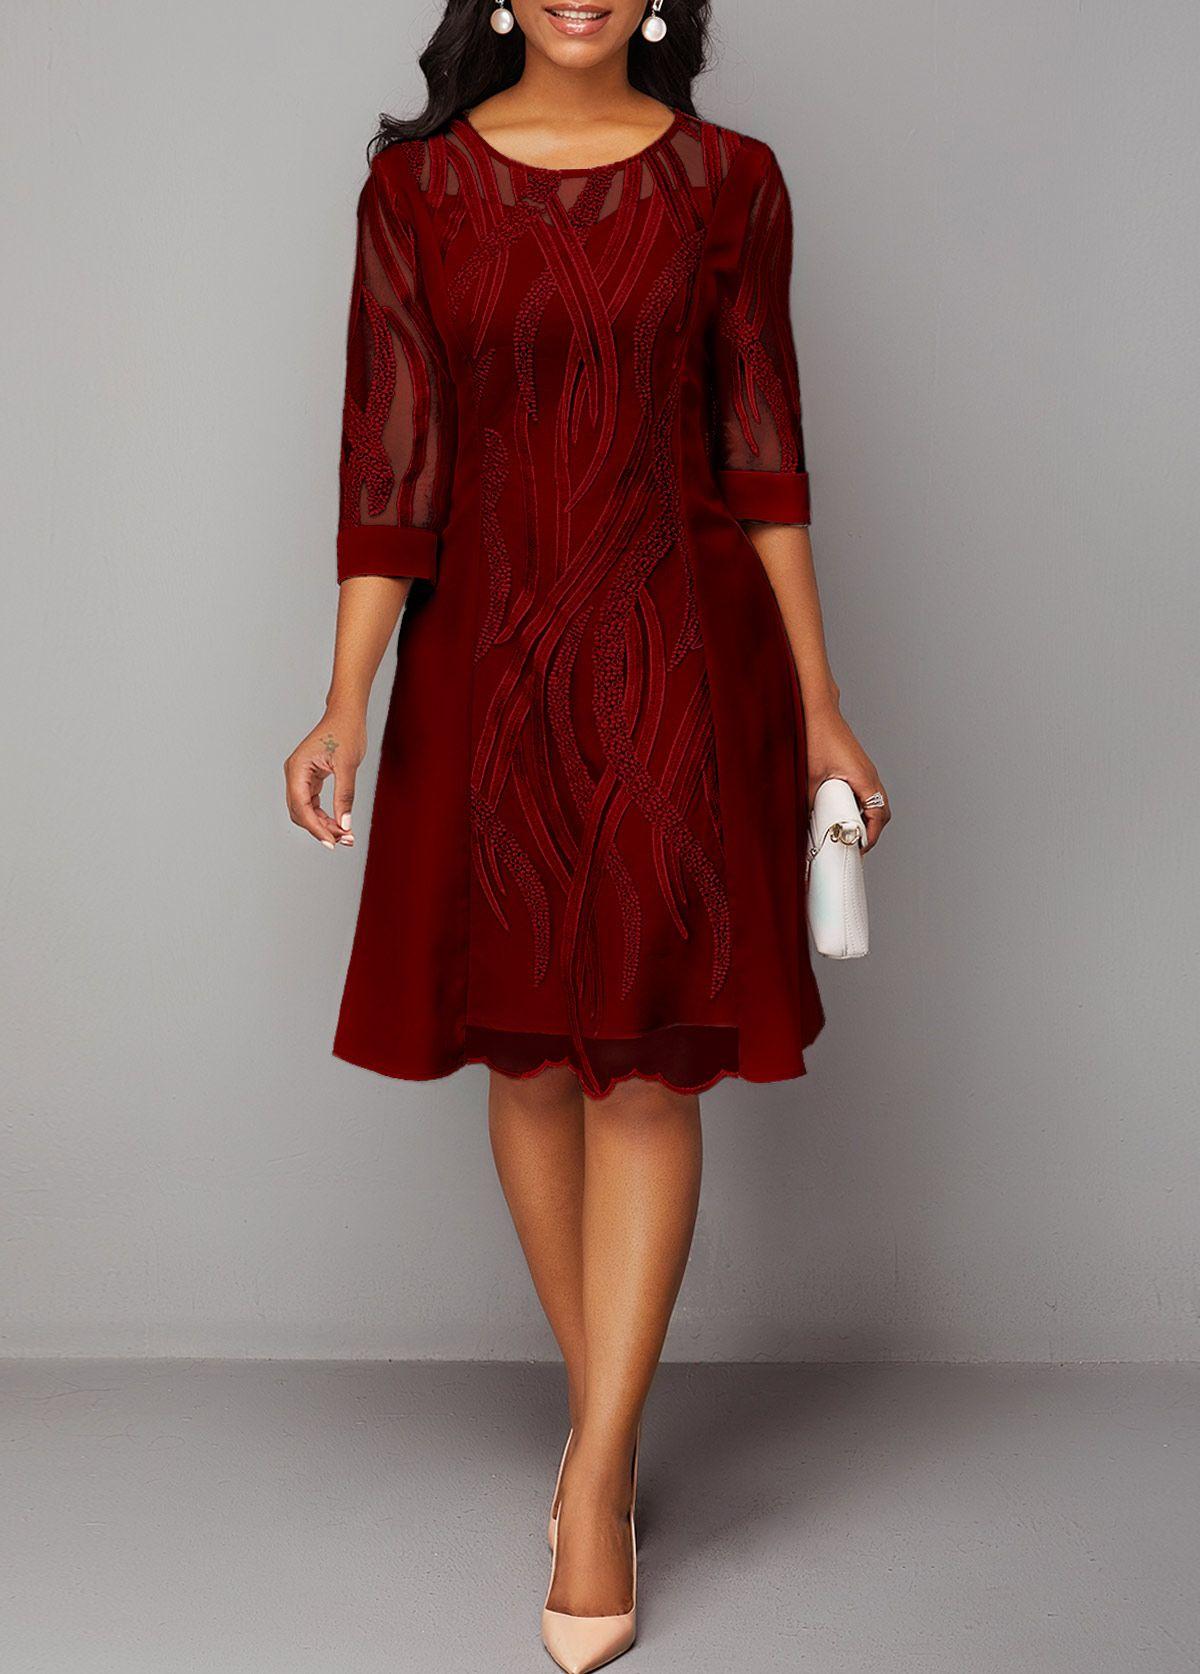 Wine Red Round Neck Back Zipper Lace Dress Rotita Com Usd 34 63 Lace Dress Shop Red Dress Womens Dresses [ 1674 x 1200 Pixel ]